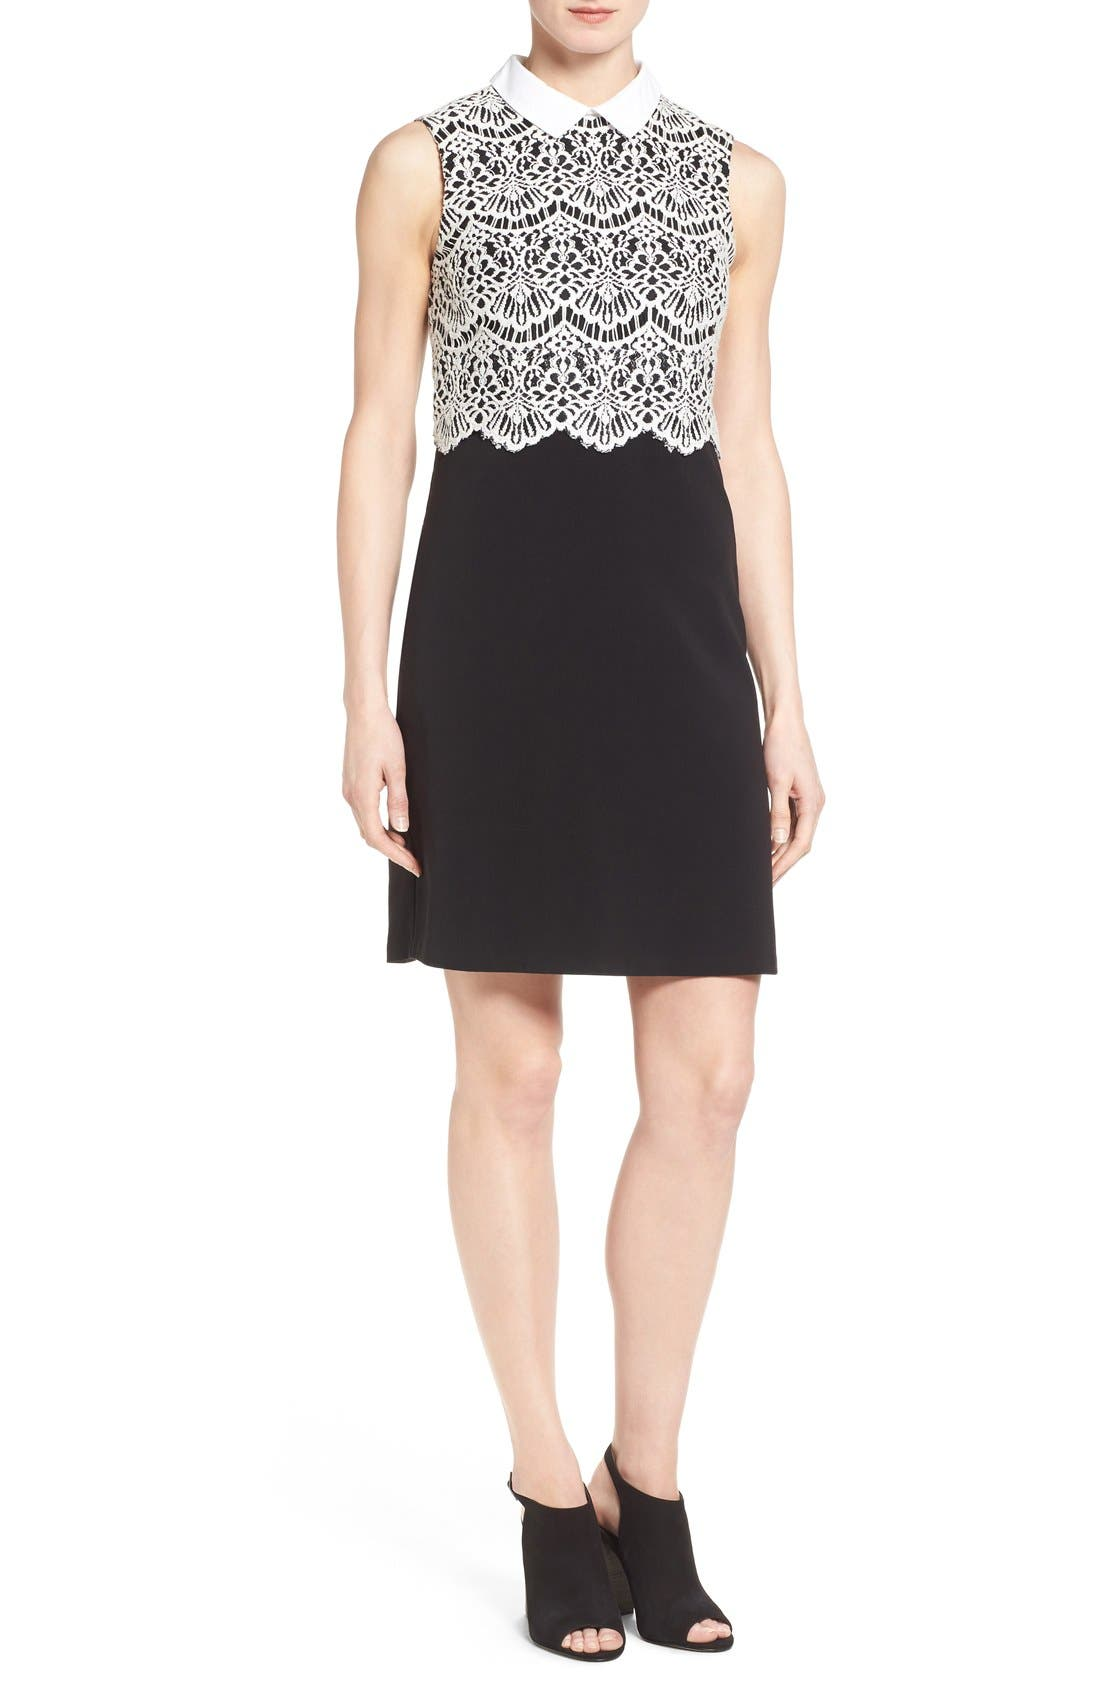 Alternate Image 1 Selected - Halogen® Collared Lace Sheath Dress (Regular & Petite)